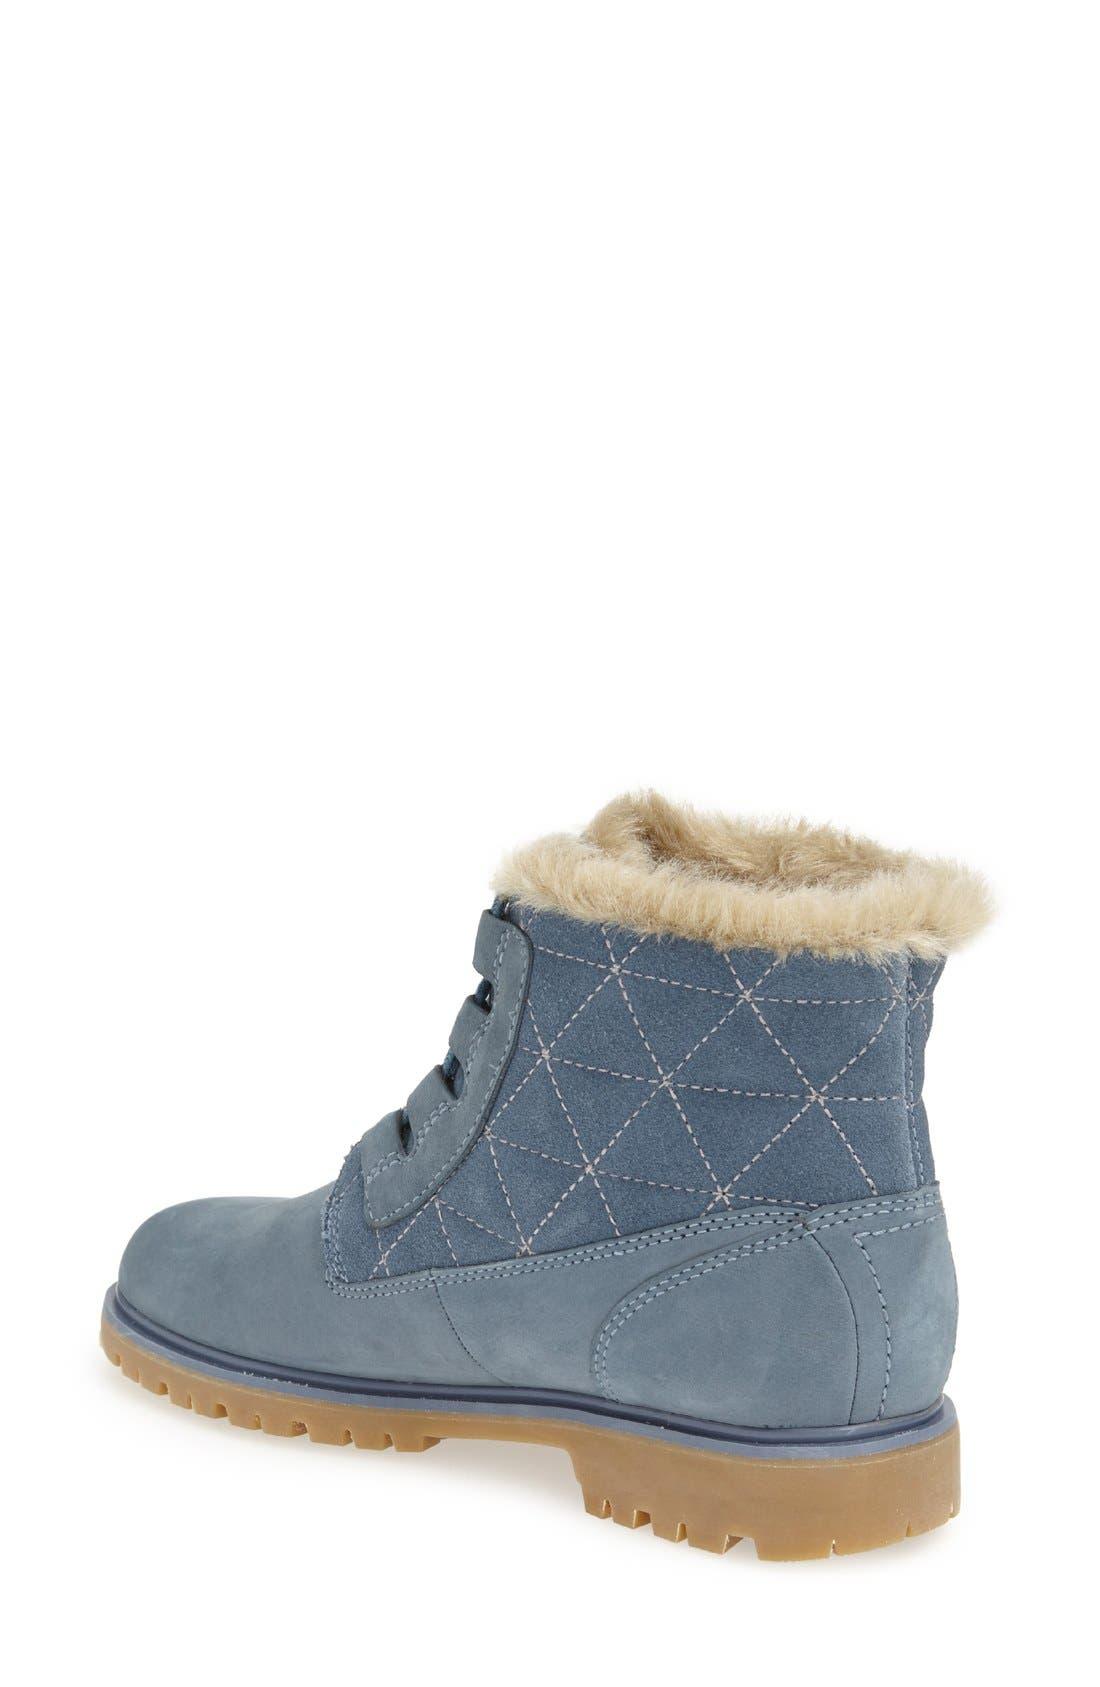 'Vega' Waterproof Leather Boot,                             Alternate thumbnail 2, color,                             400